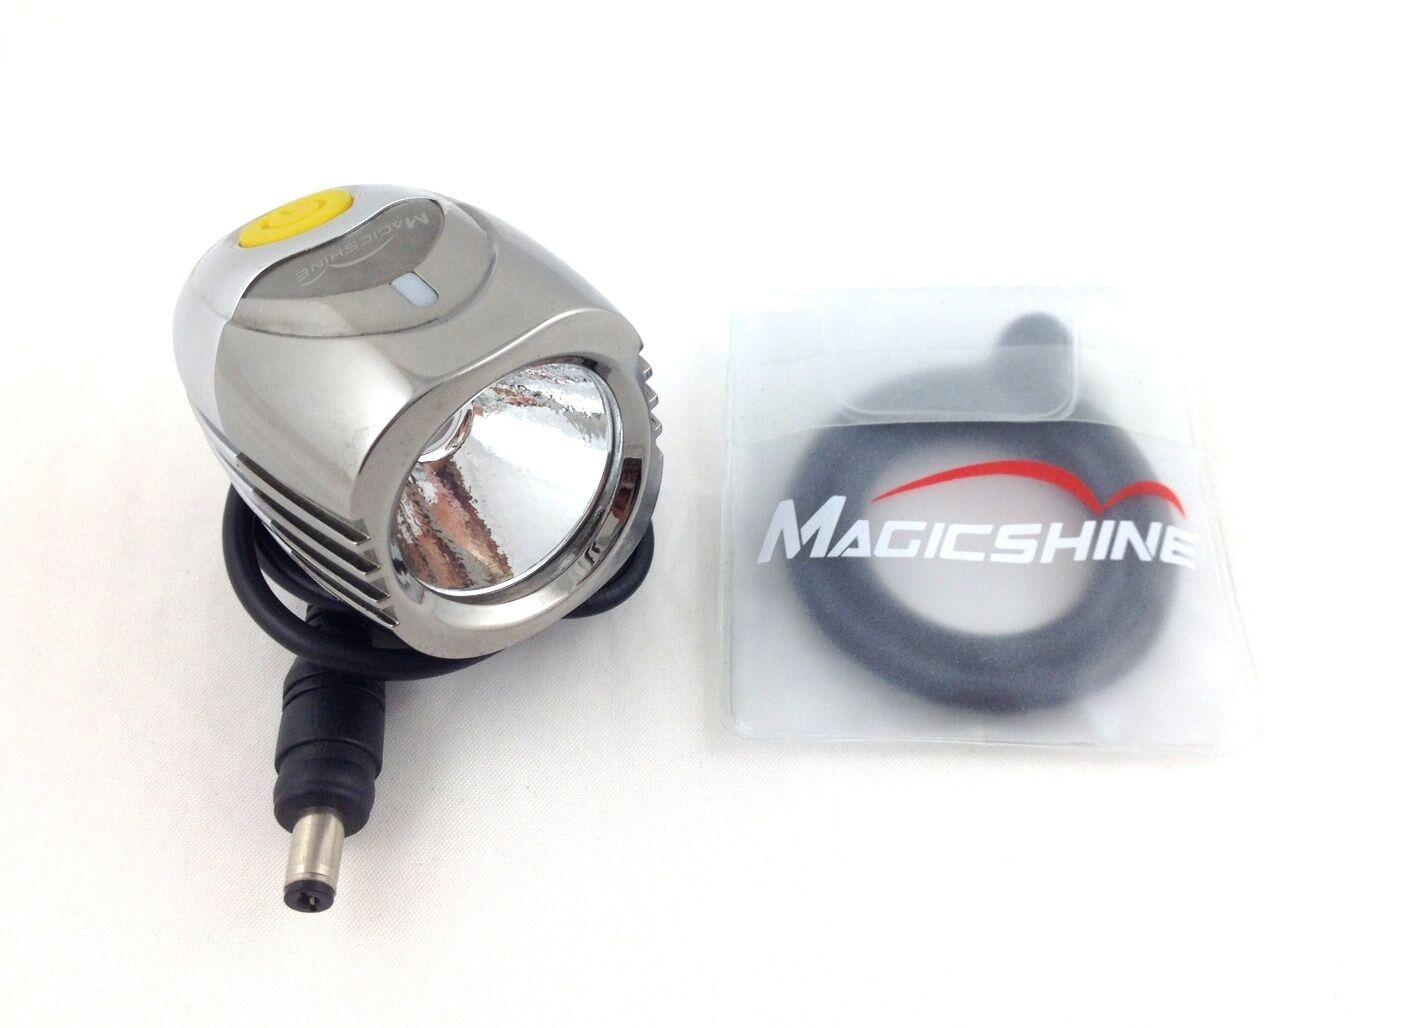 USED    MagicShine MJ868 3 Mode 1000 Lumen LED Bike Light Head ONLY + O-rings  promotions